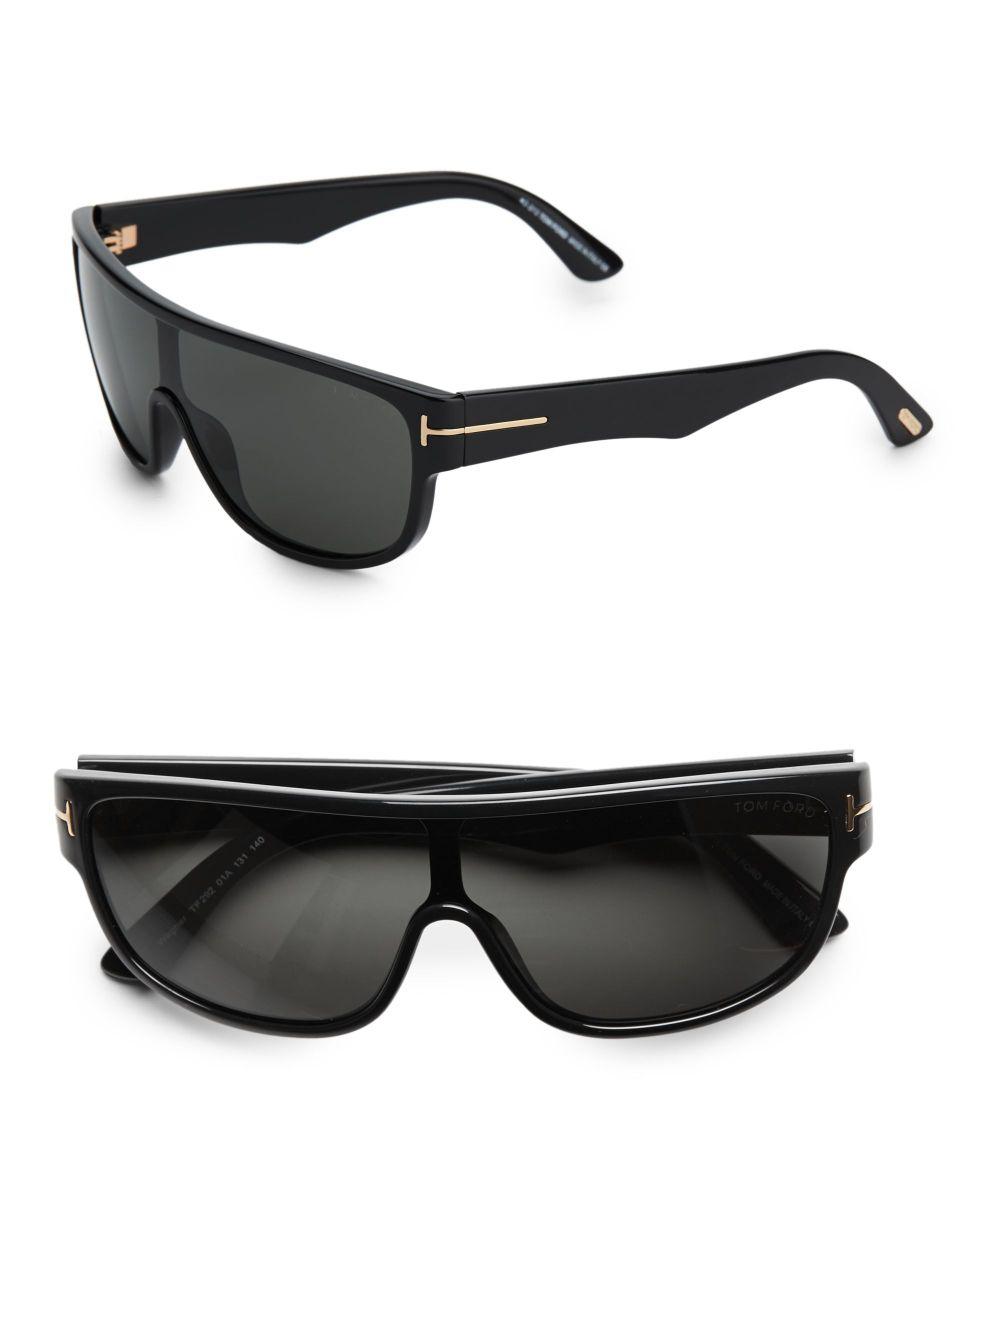 54253dcc9d Lyst Tom For Shield Black Sunglasses Ford Wagner Men In Oversized nBOd4nrp